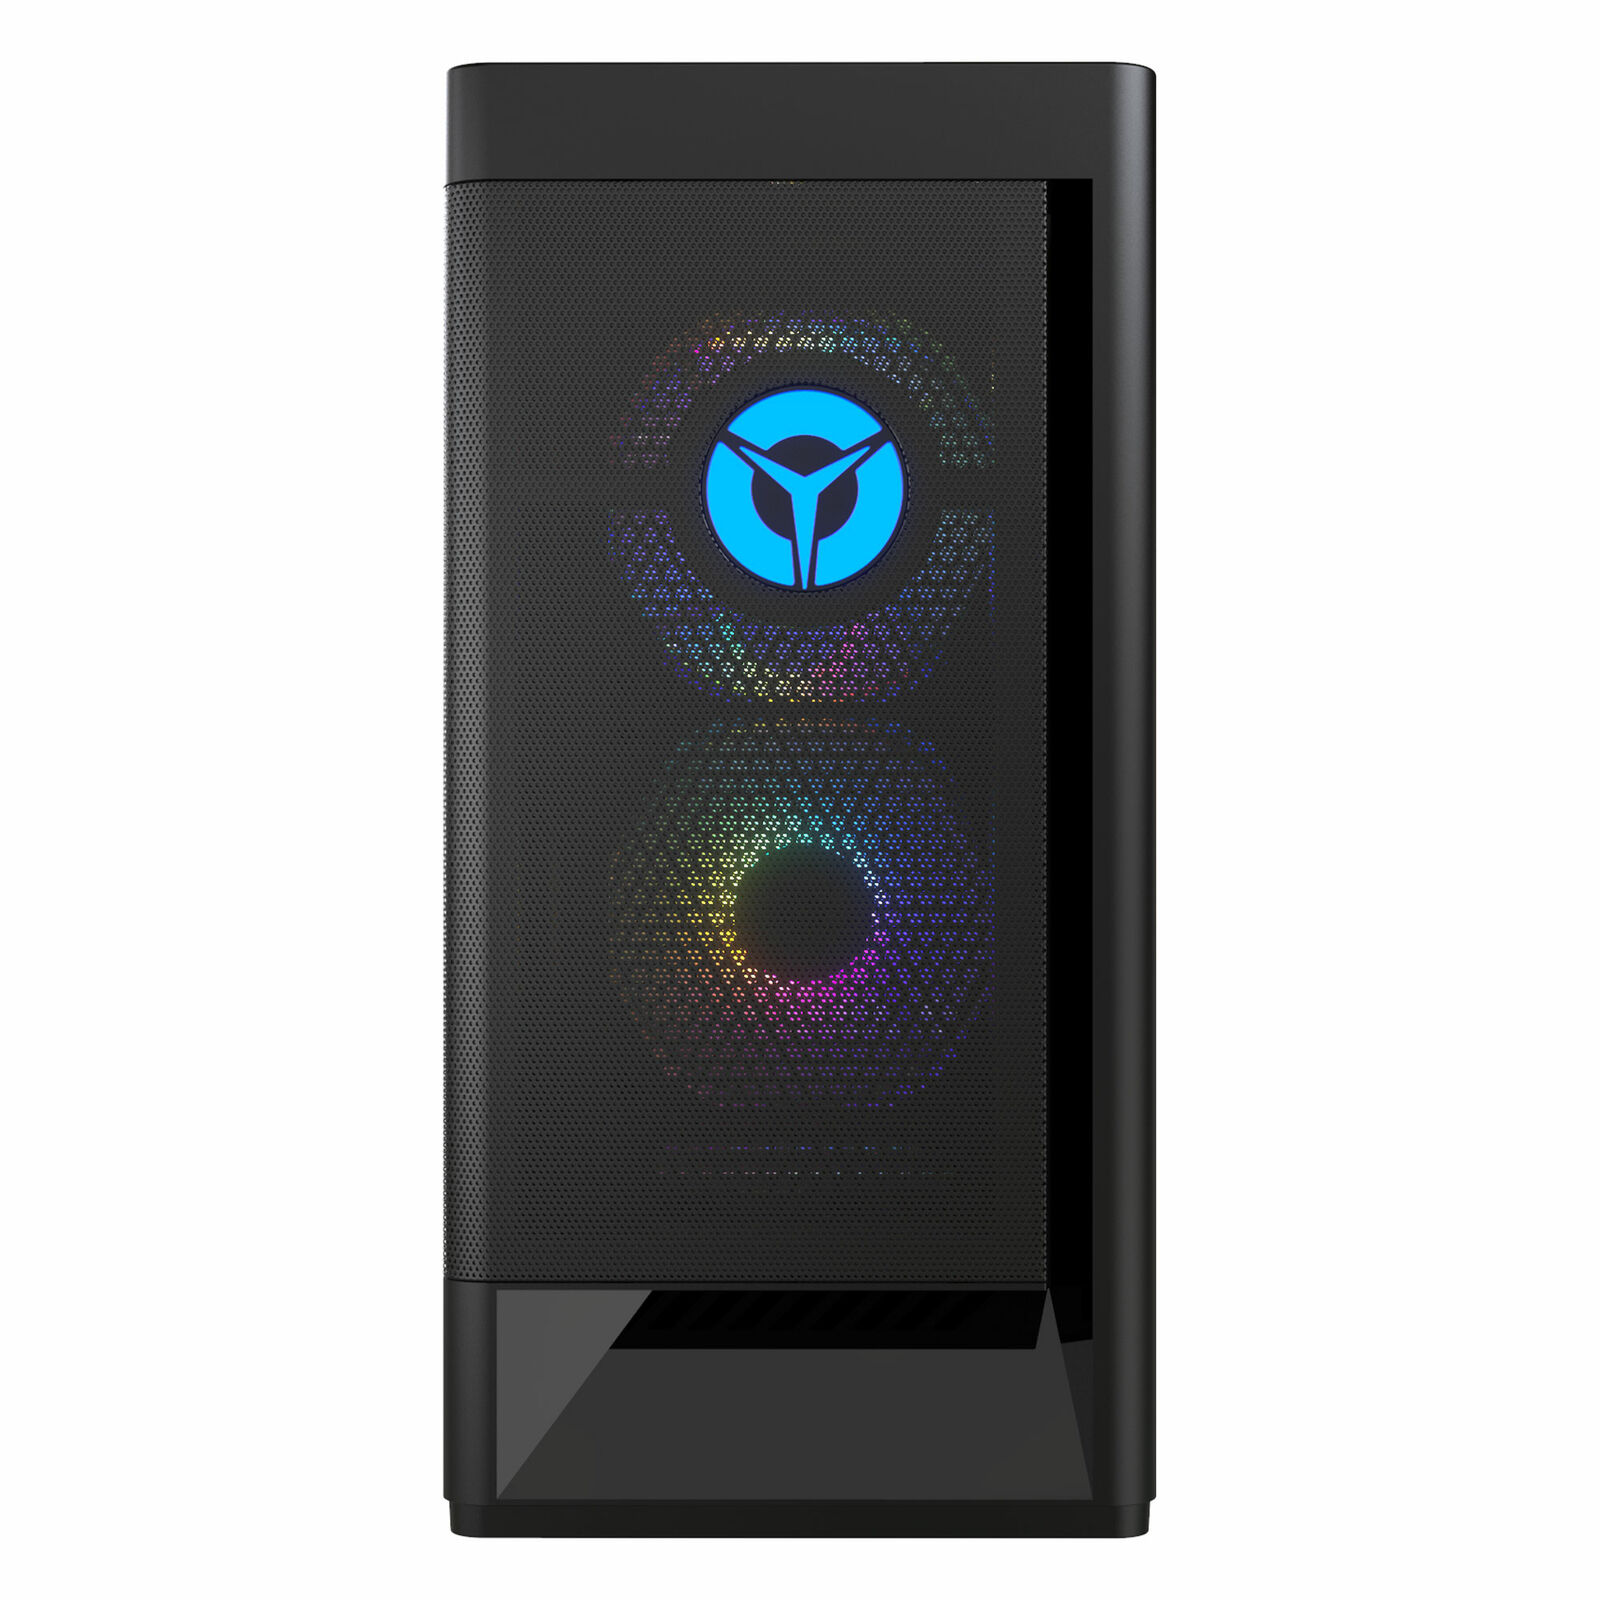 Lenovo Legion Tower 5 Desktop, Ryzen 7 3700X,  GeForce GTX 1660 Super 6GB, 16GB